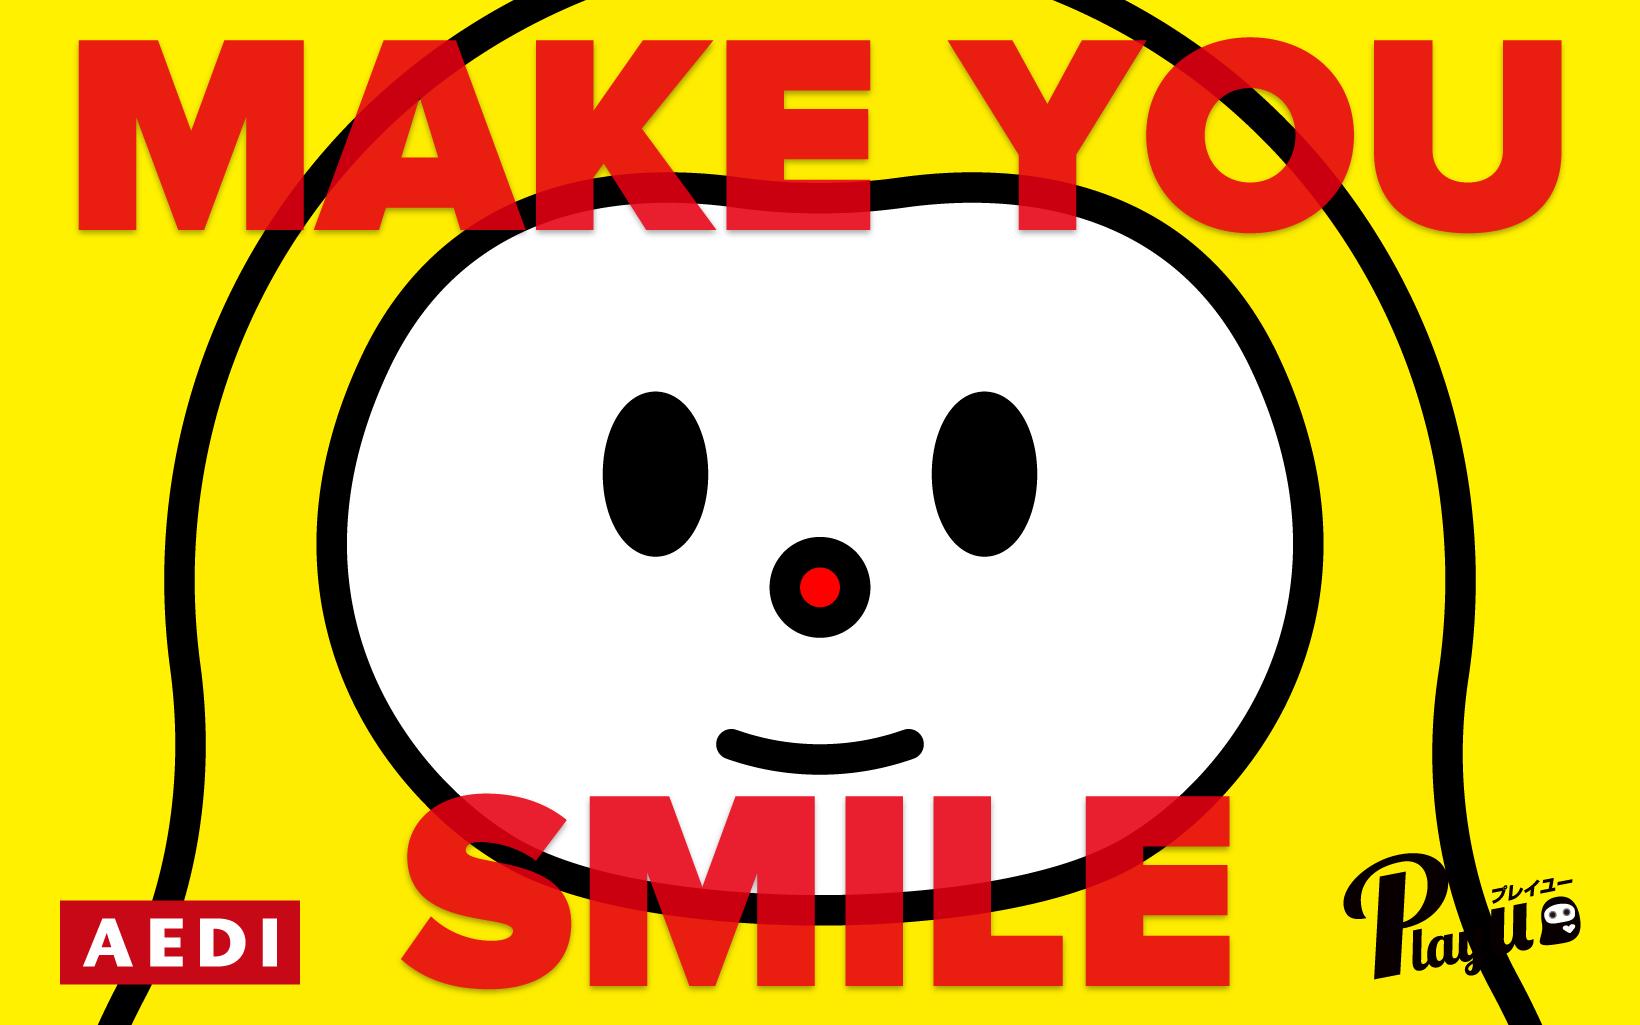 MAKE YOU SMILE 岡山県倉敷市のWebとデザインの制作会社 AEDI デザイン・ホームページ制作